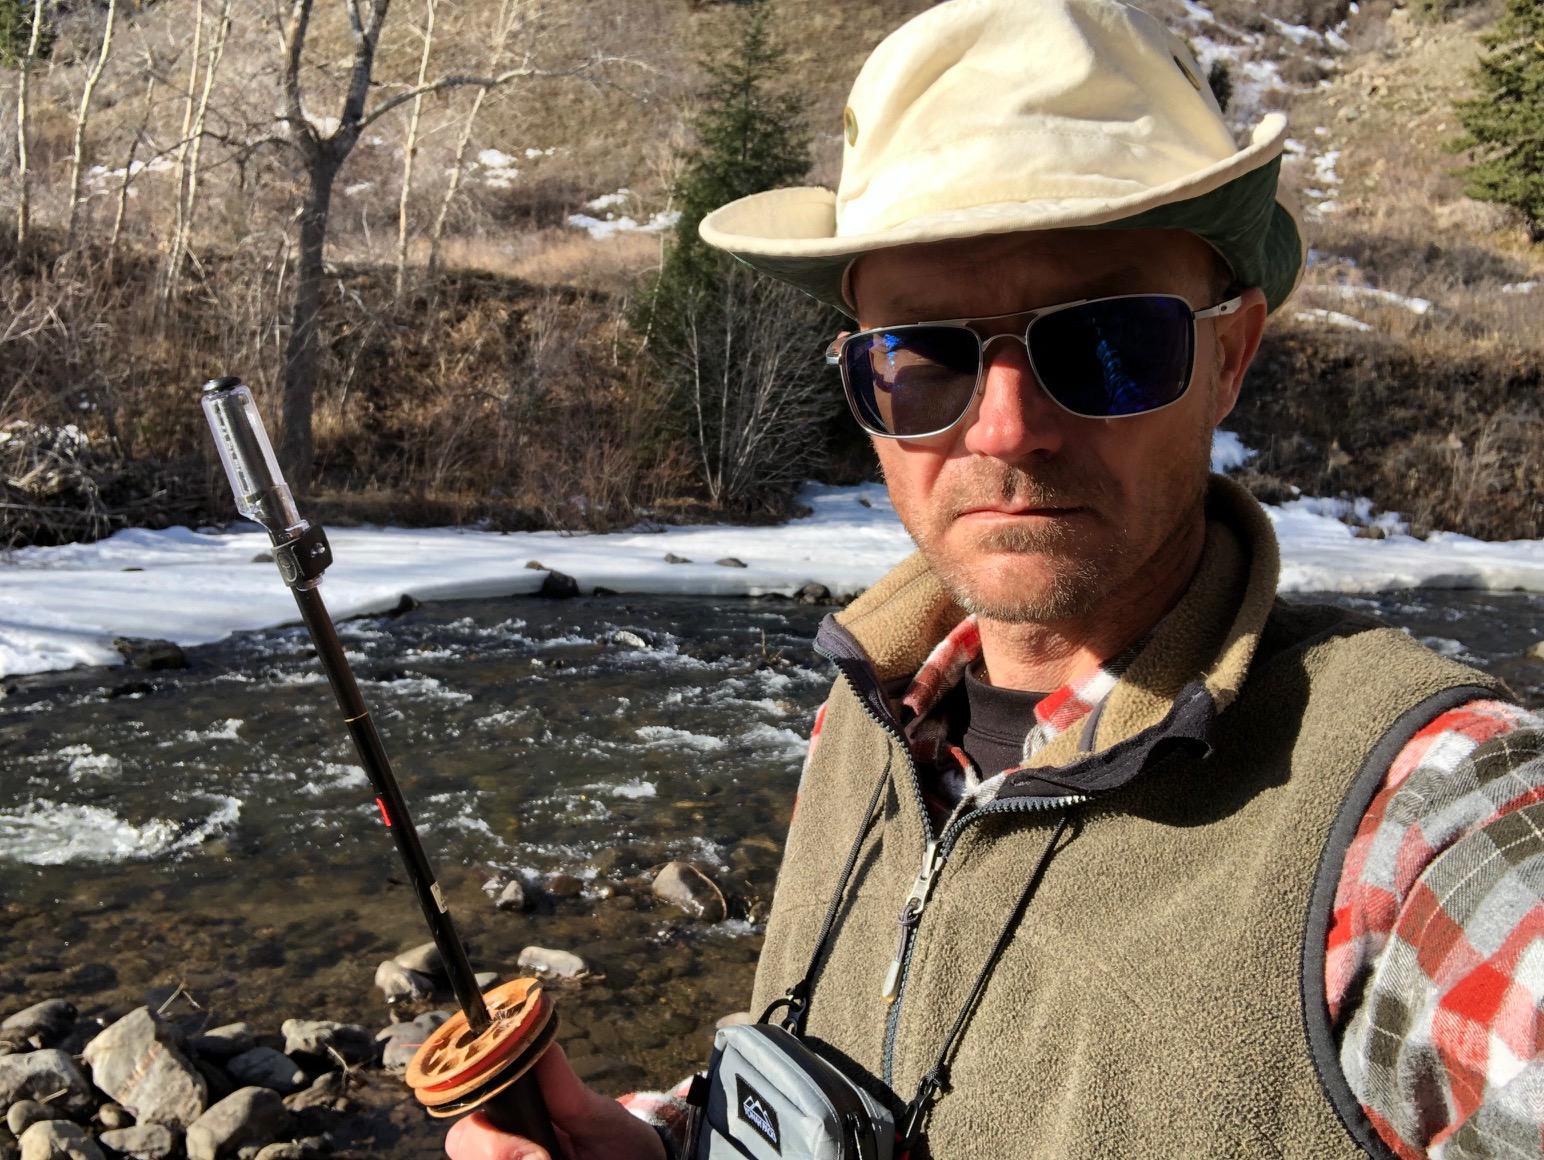 Jason Klass Fishing Tenkara on the St. Vrain